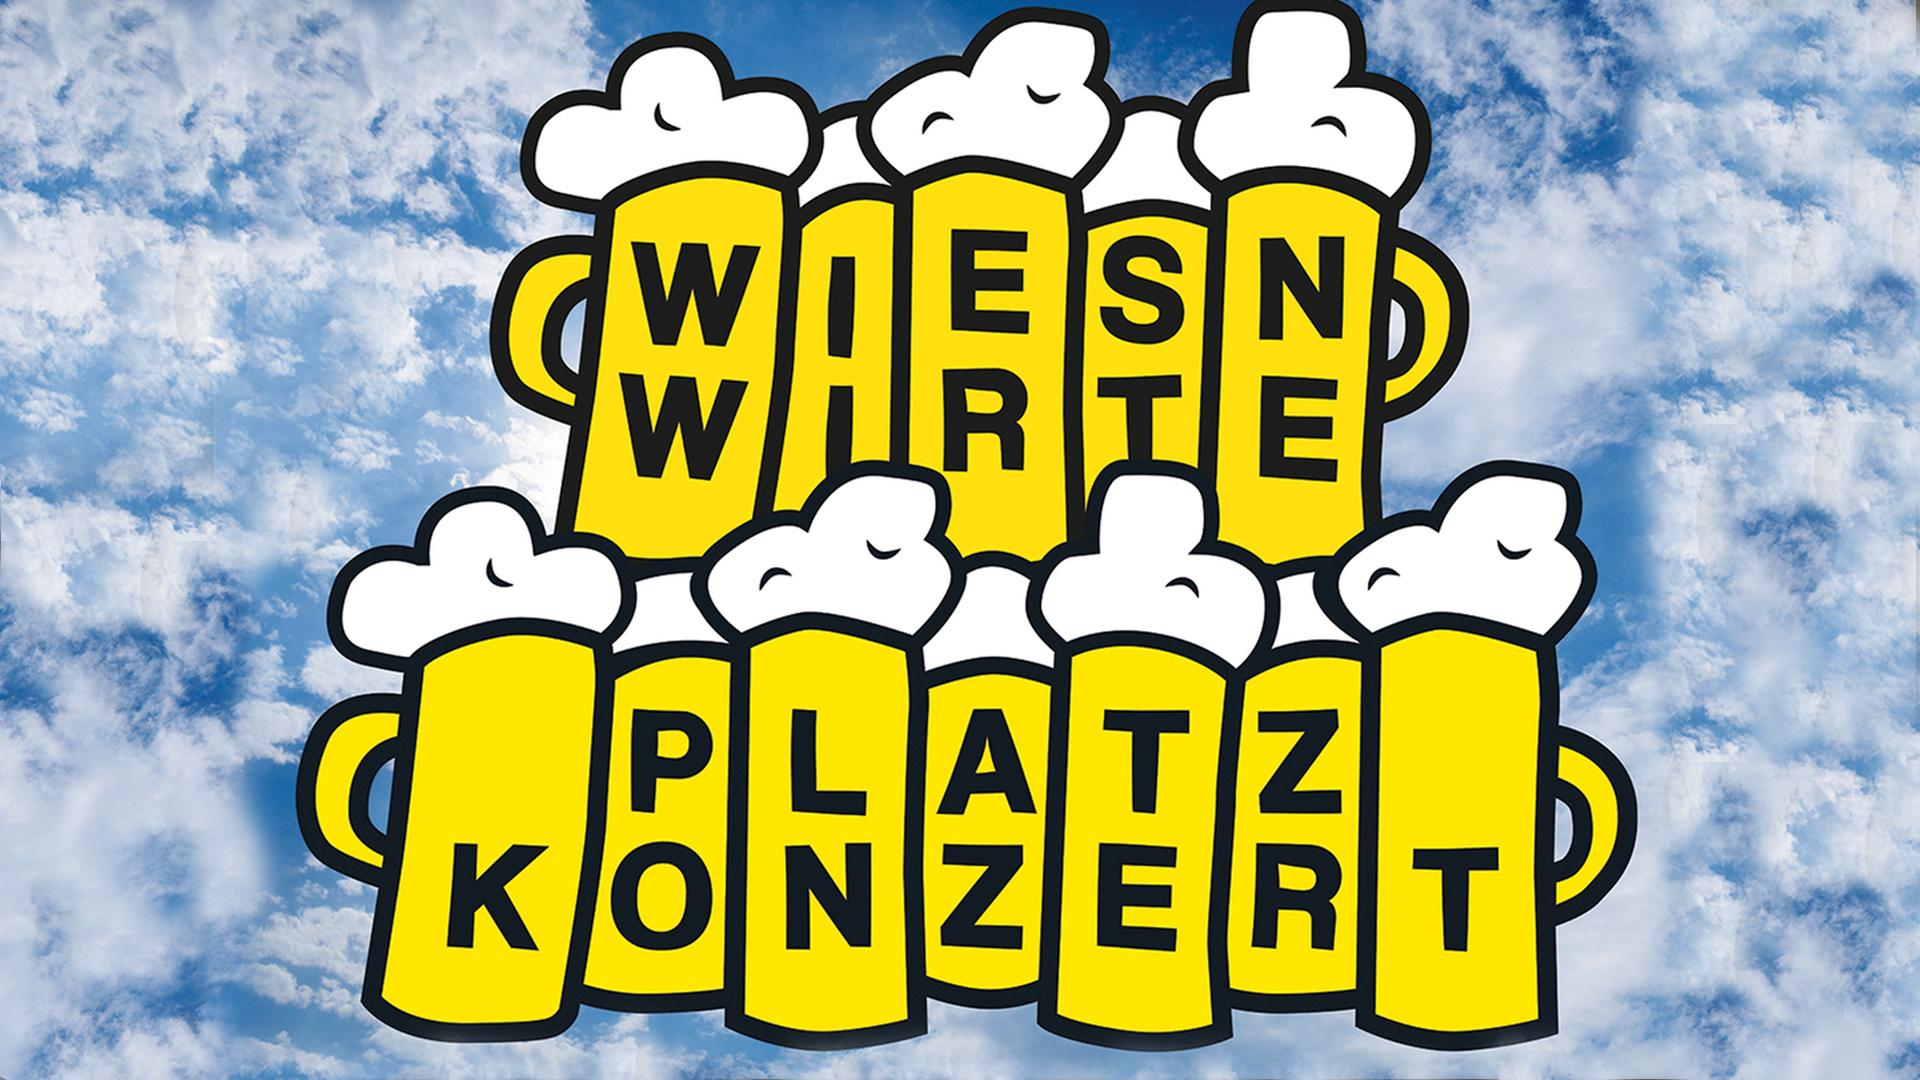 times-art-com-wiesn-wirte-logo